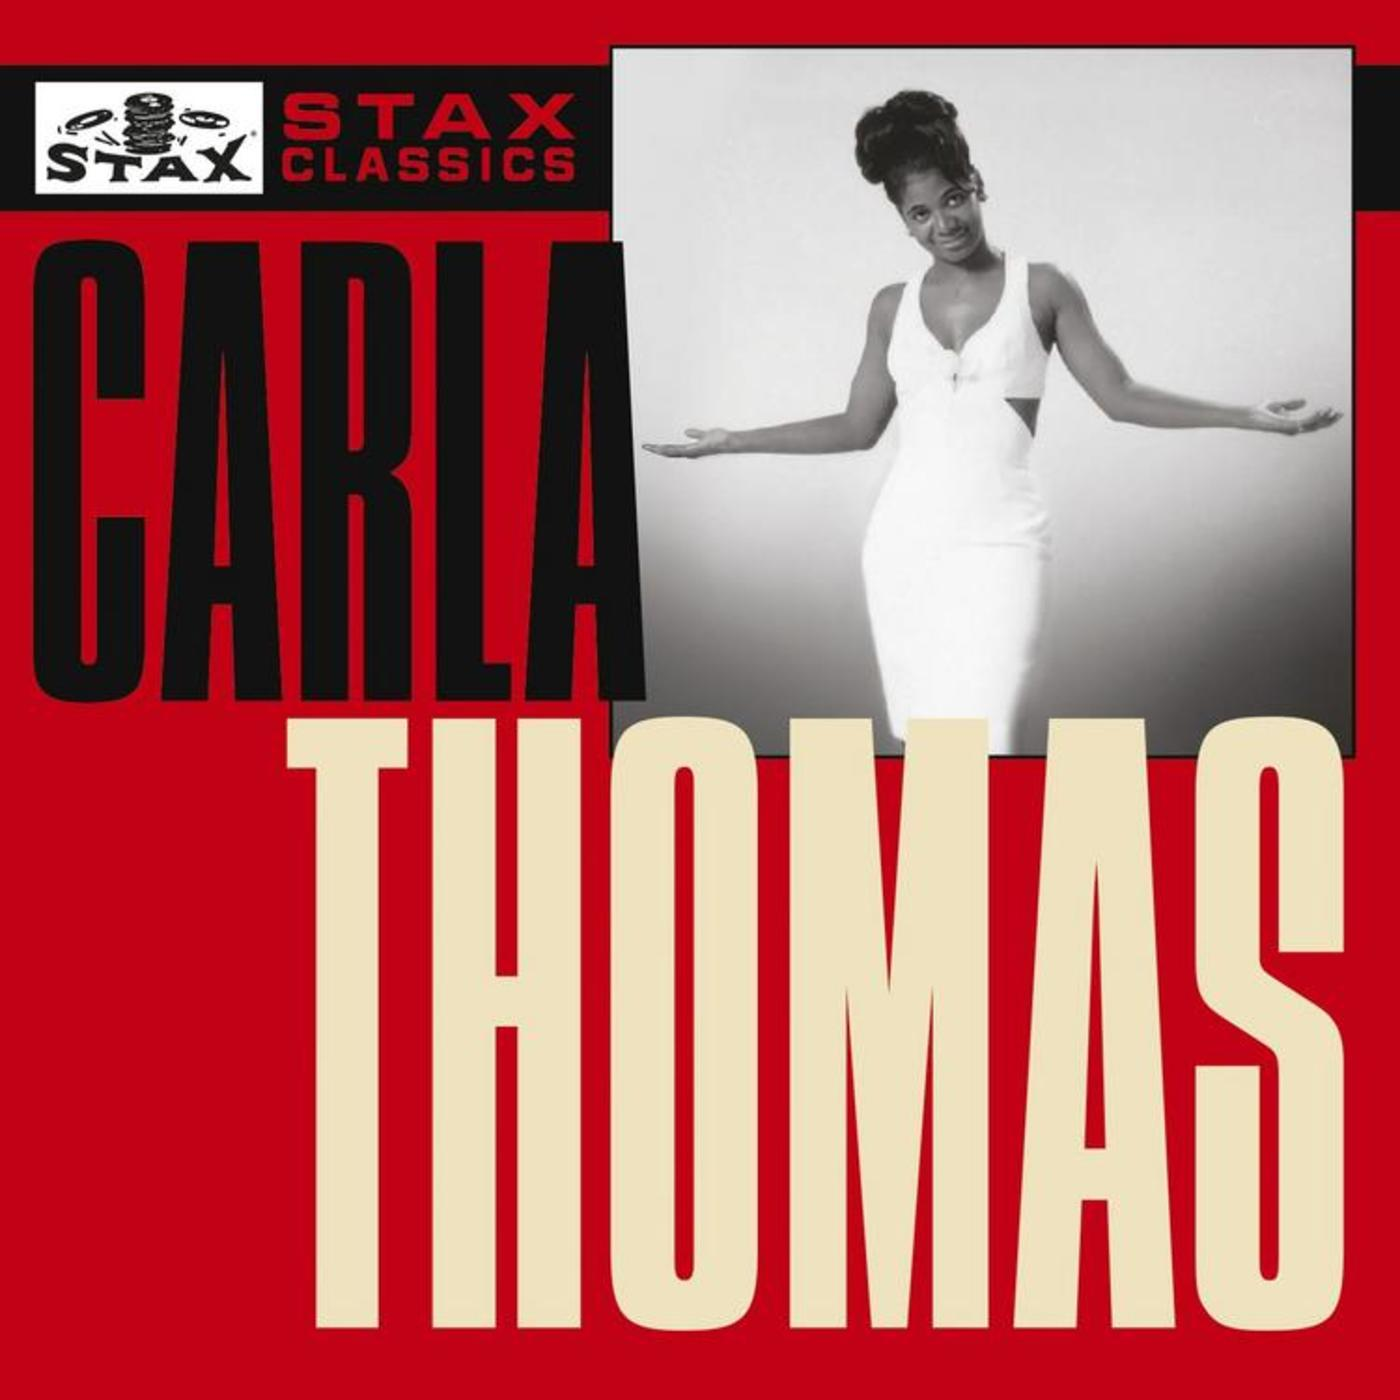 stax classics carla thomas